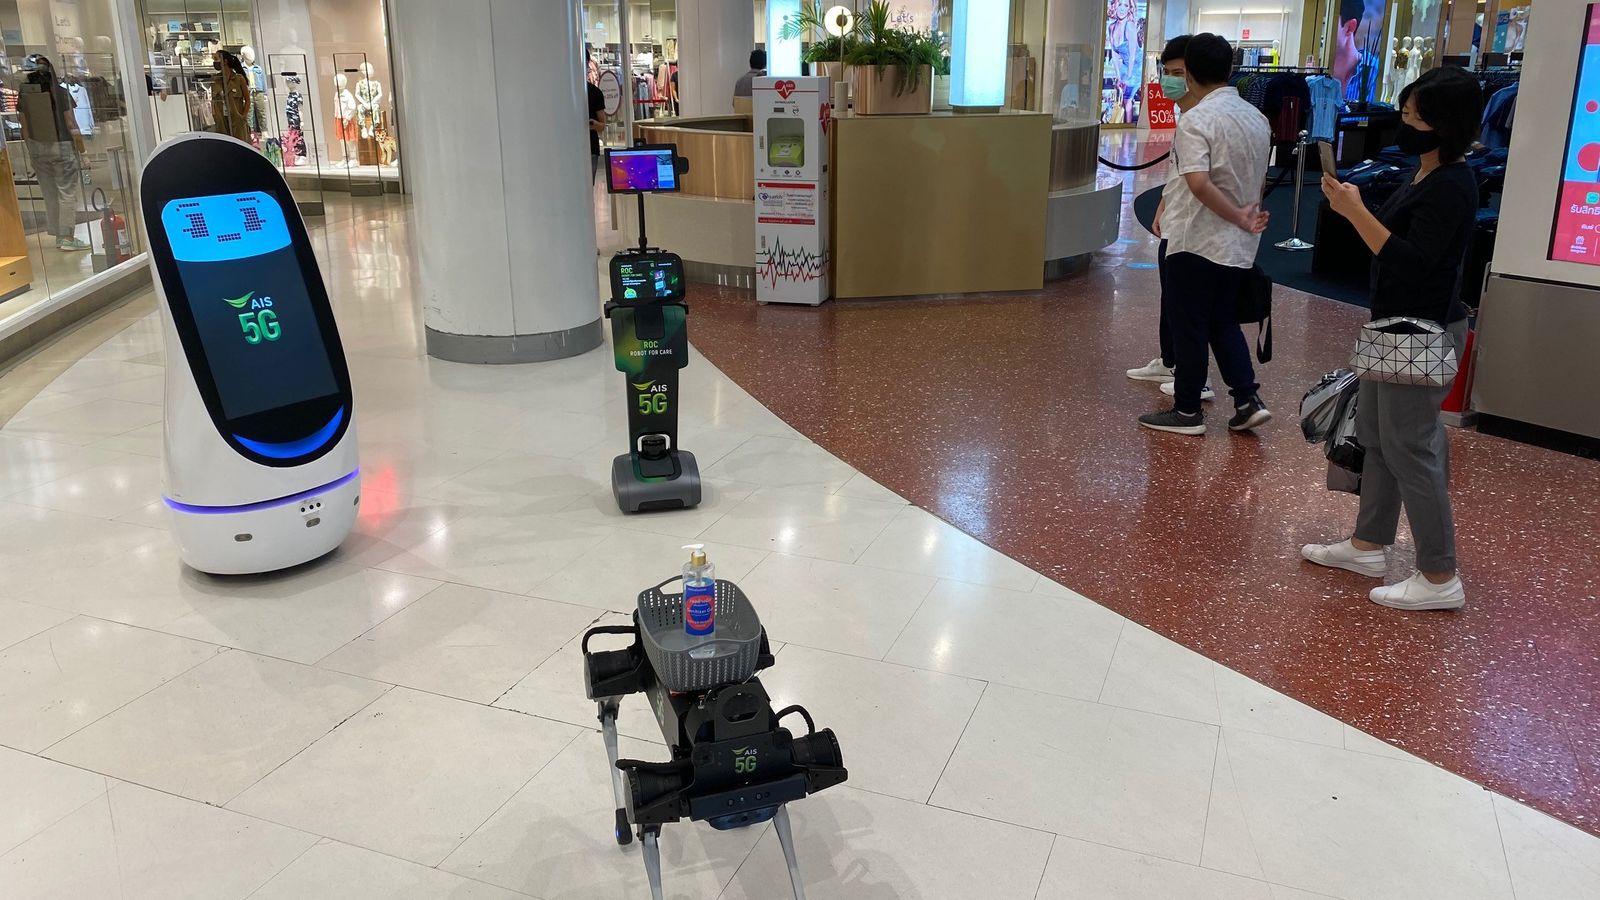 skynews-thailand-k9-robots_4995312